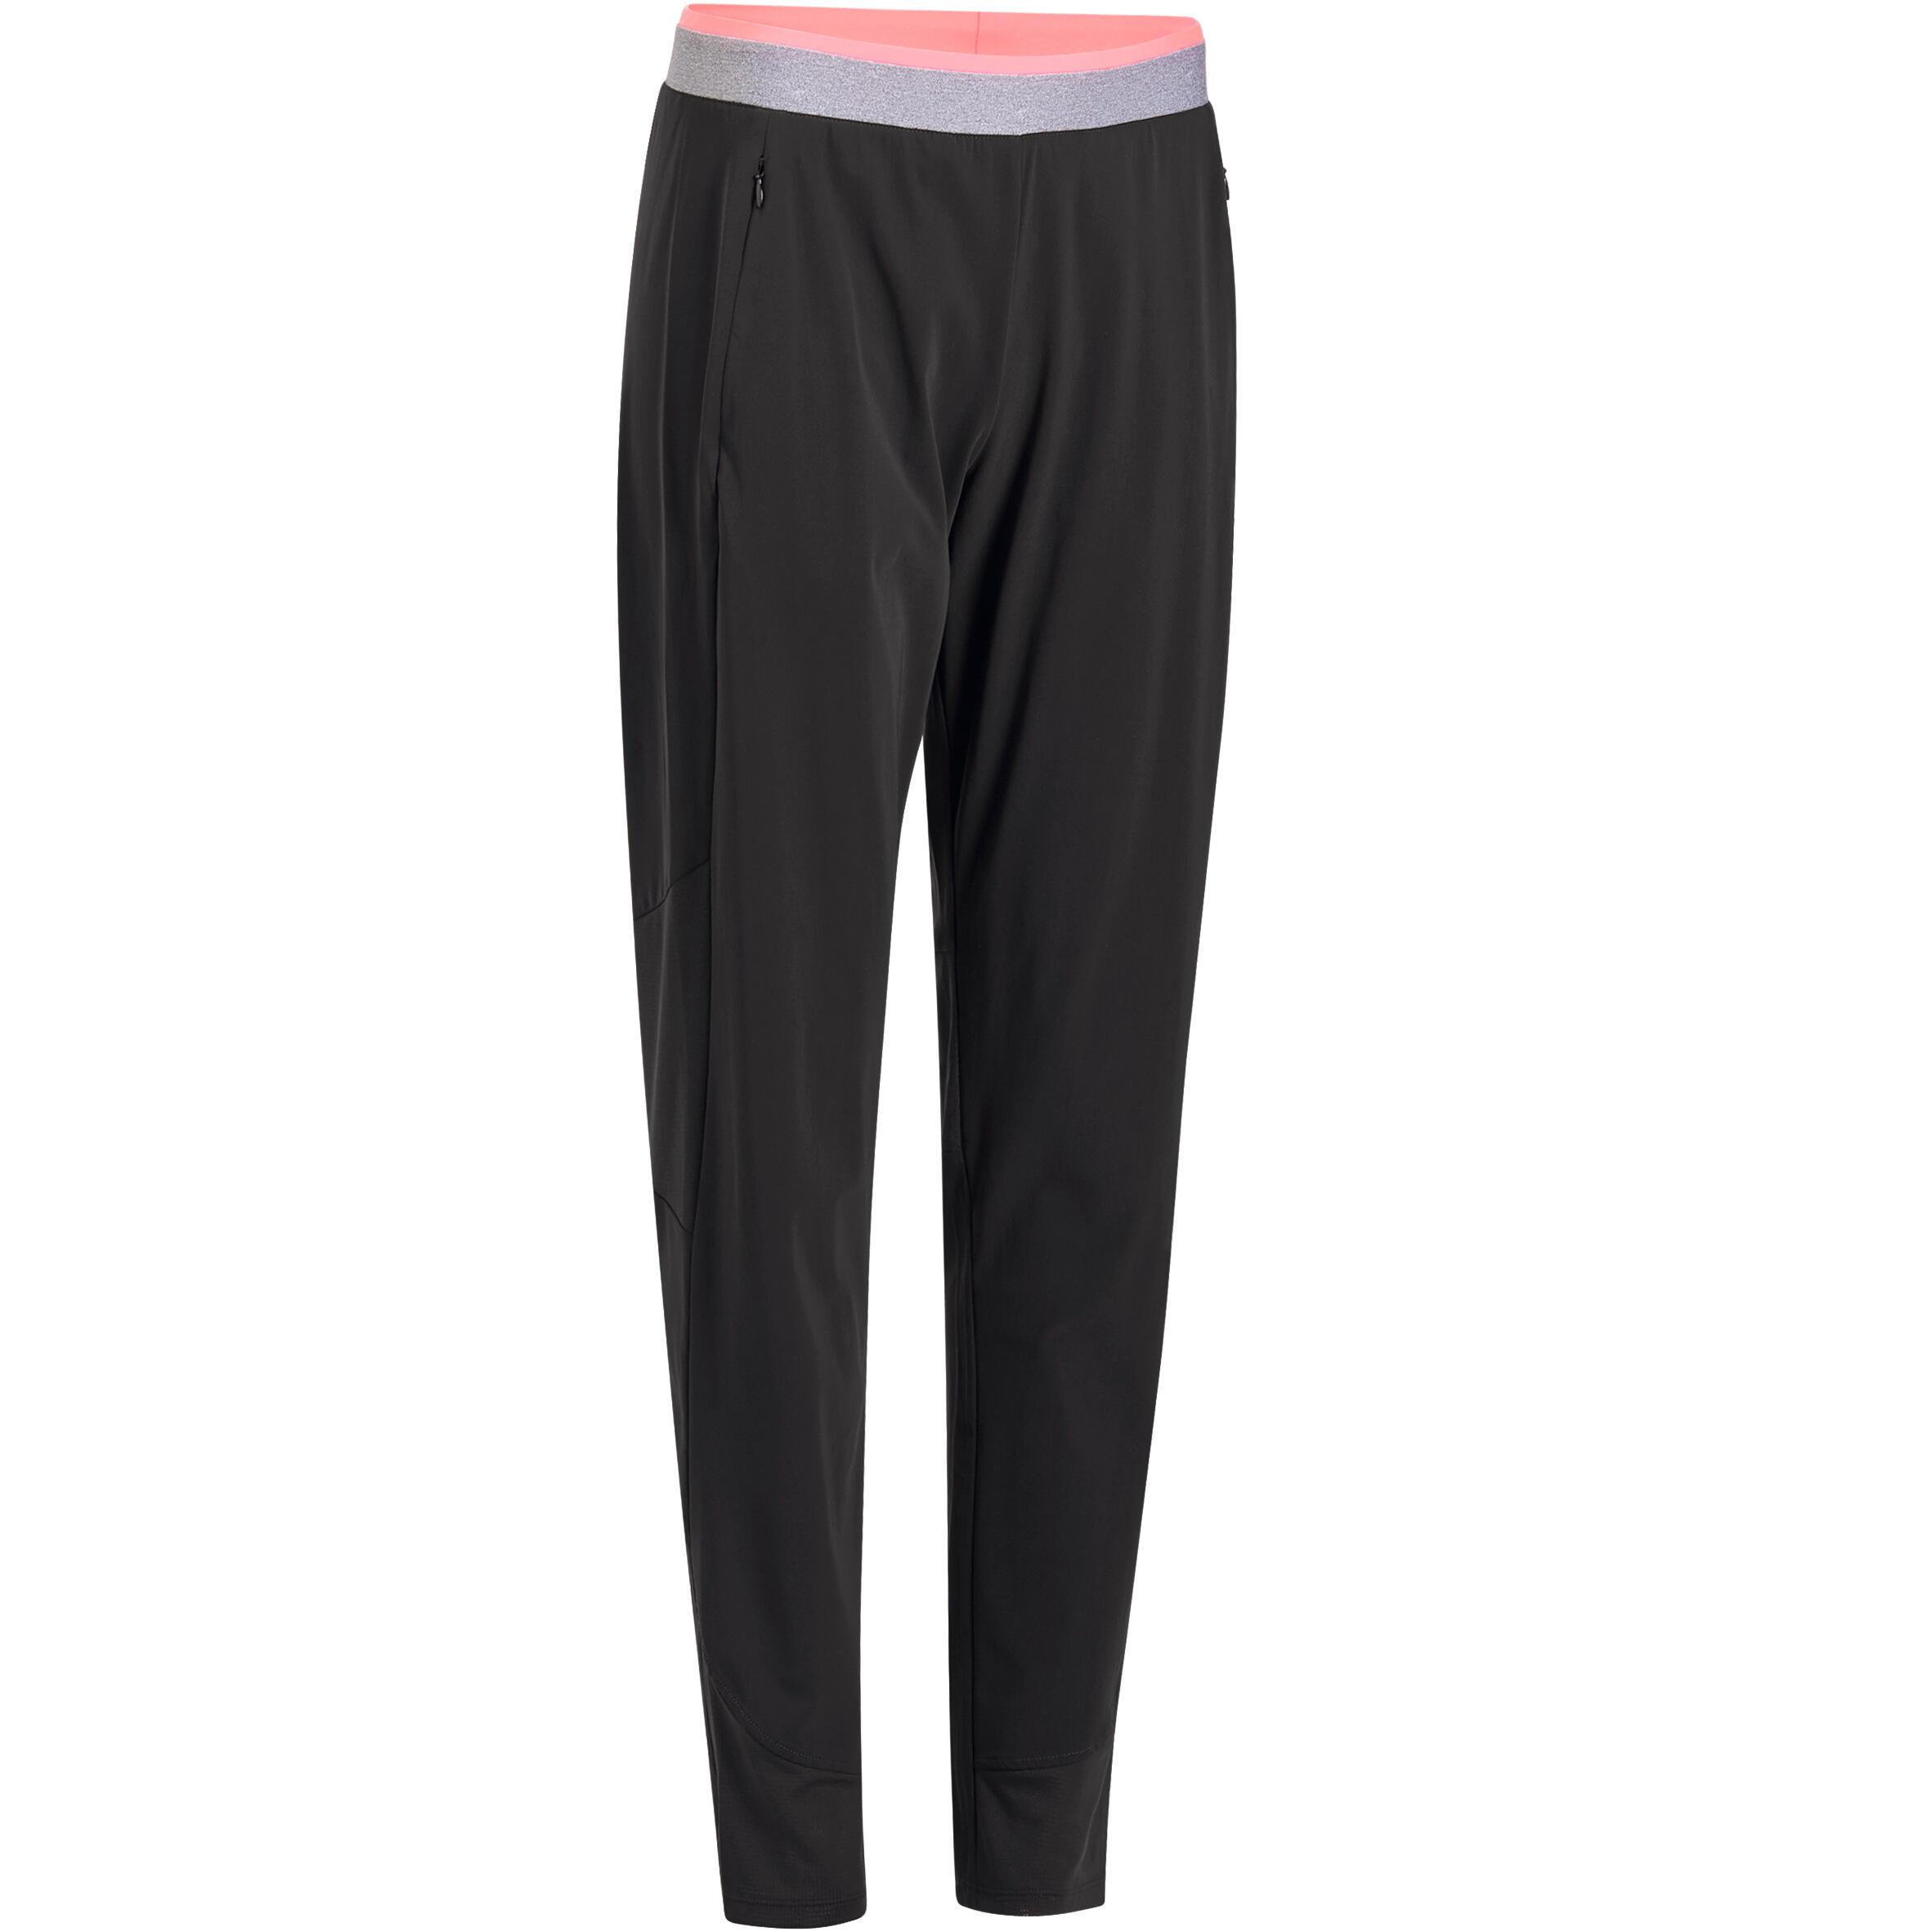 Pantalon cardio femme noir Énergie